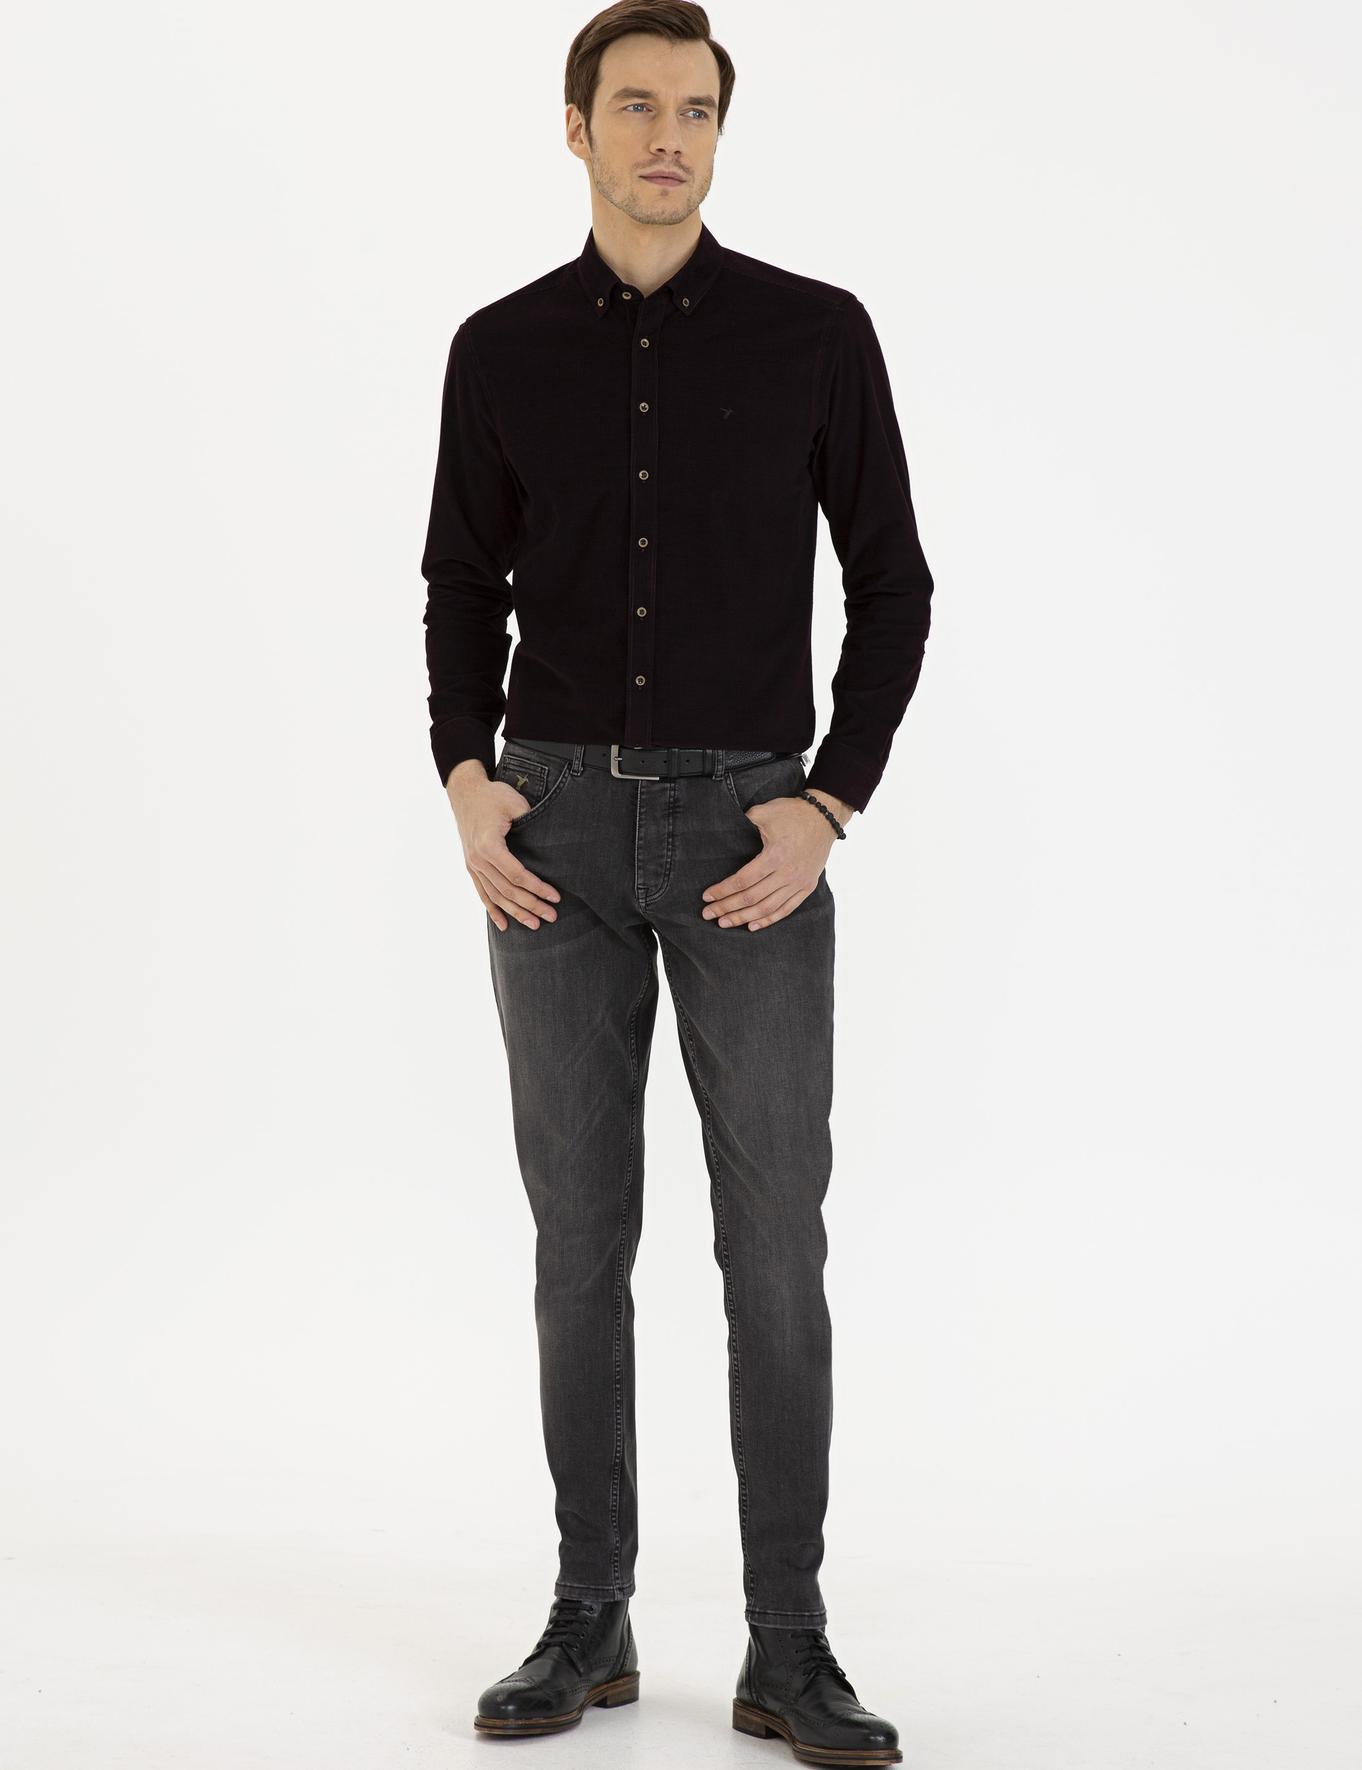 Kahverengi Slim Fit Gömlek - 50227351008